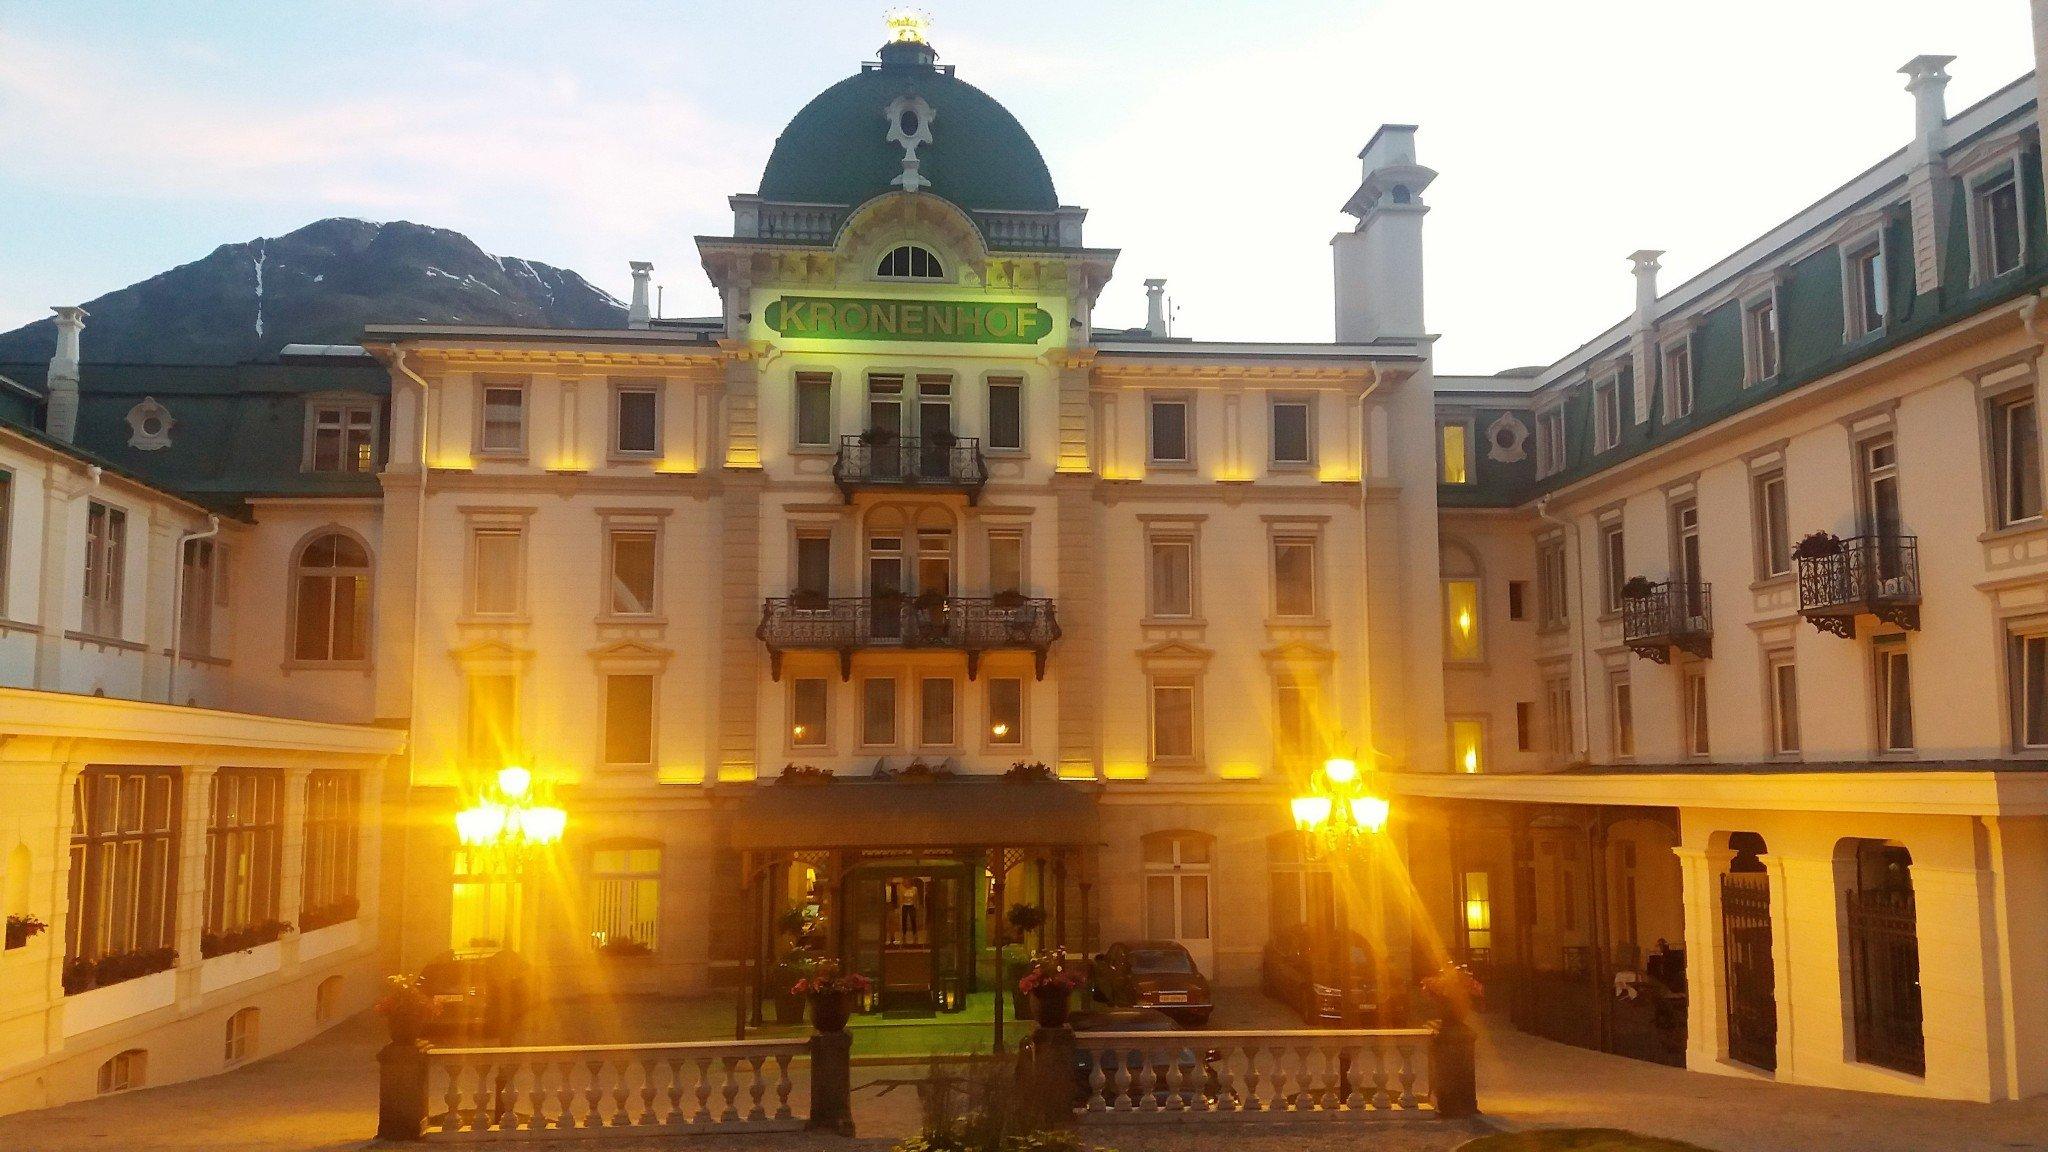 Grang Hotel Kronenhof exterior